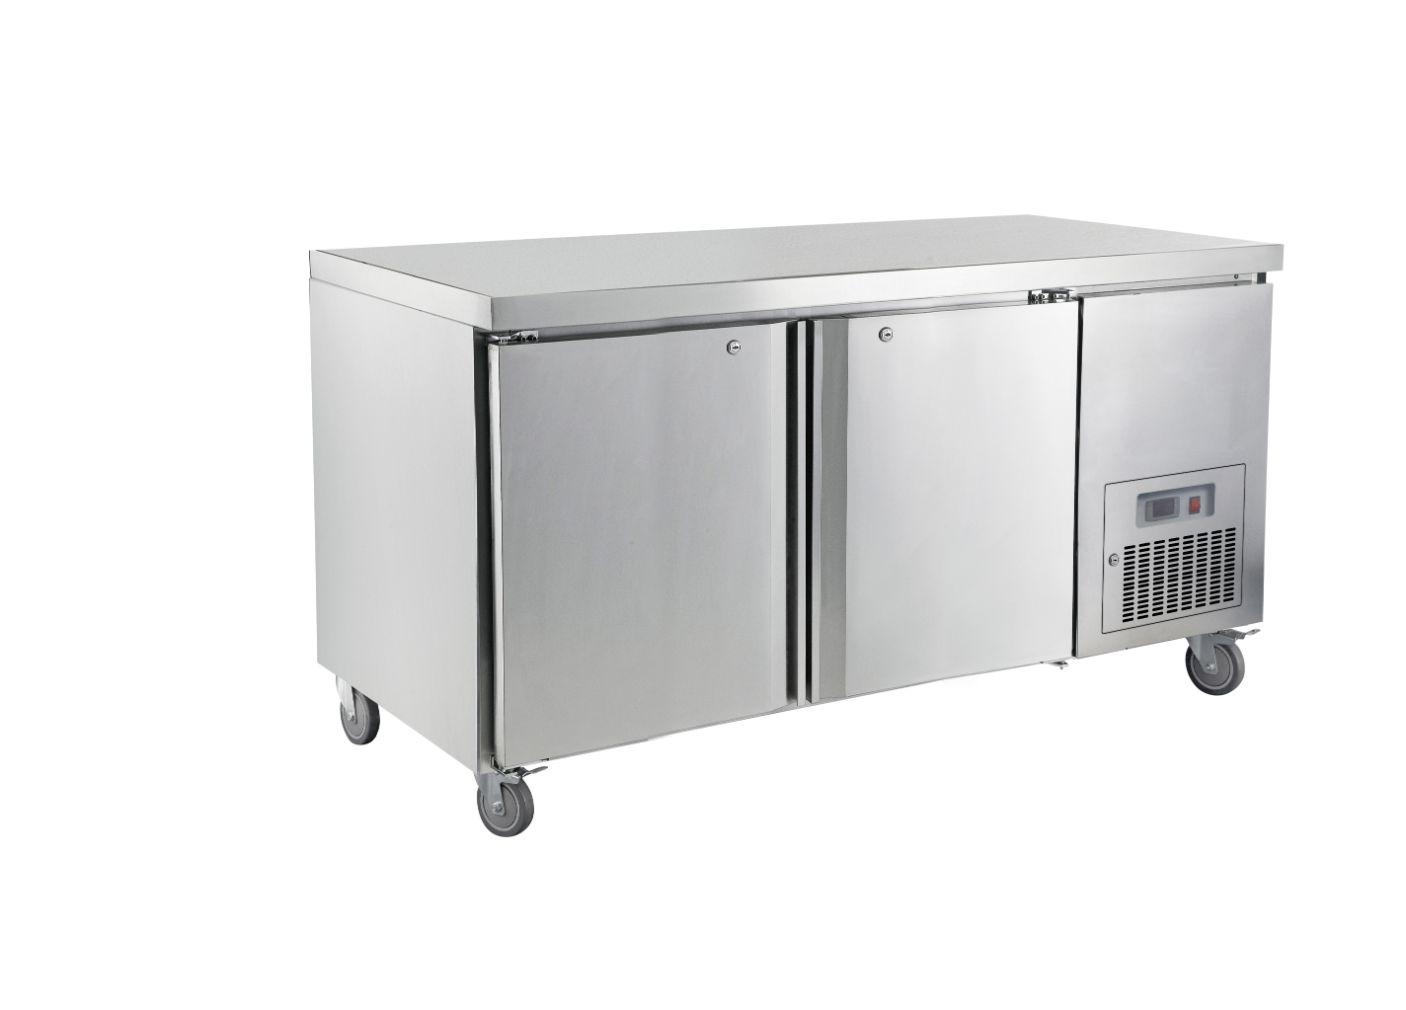 Saltas CUS1500 Undercounter Refrigerator